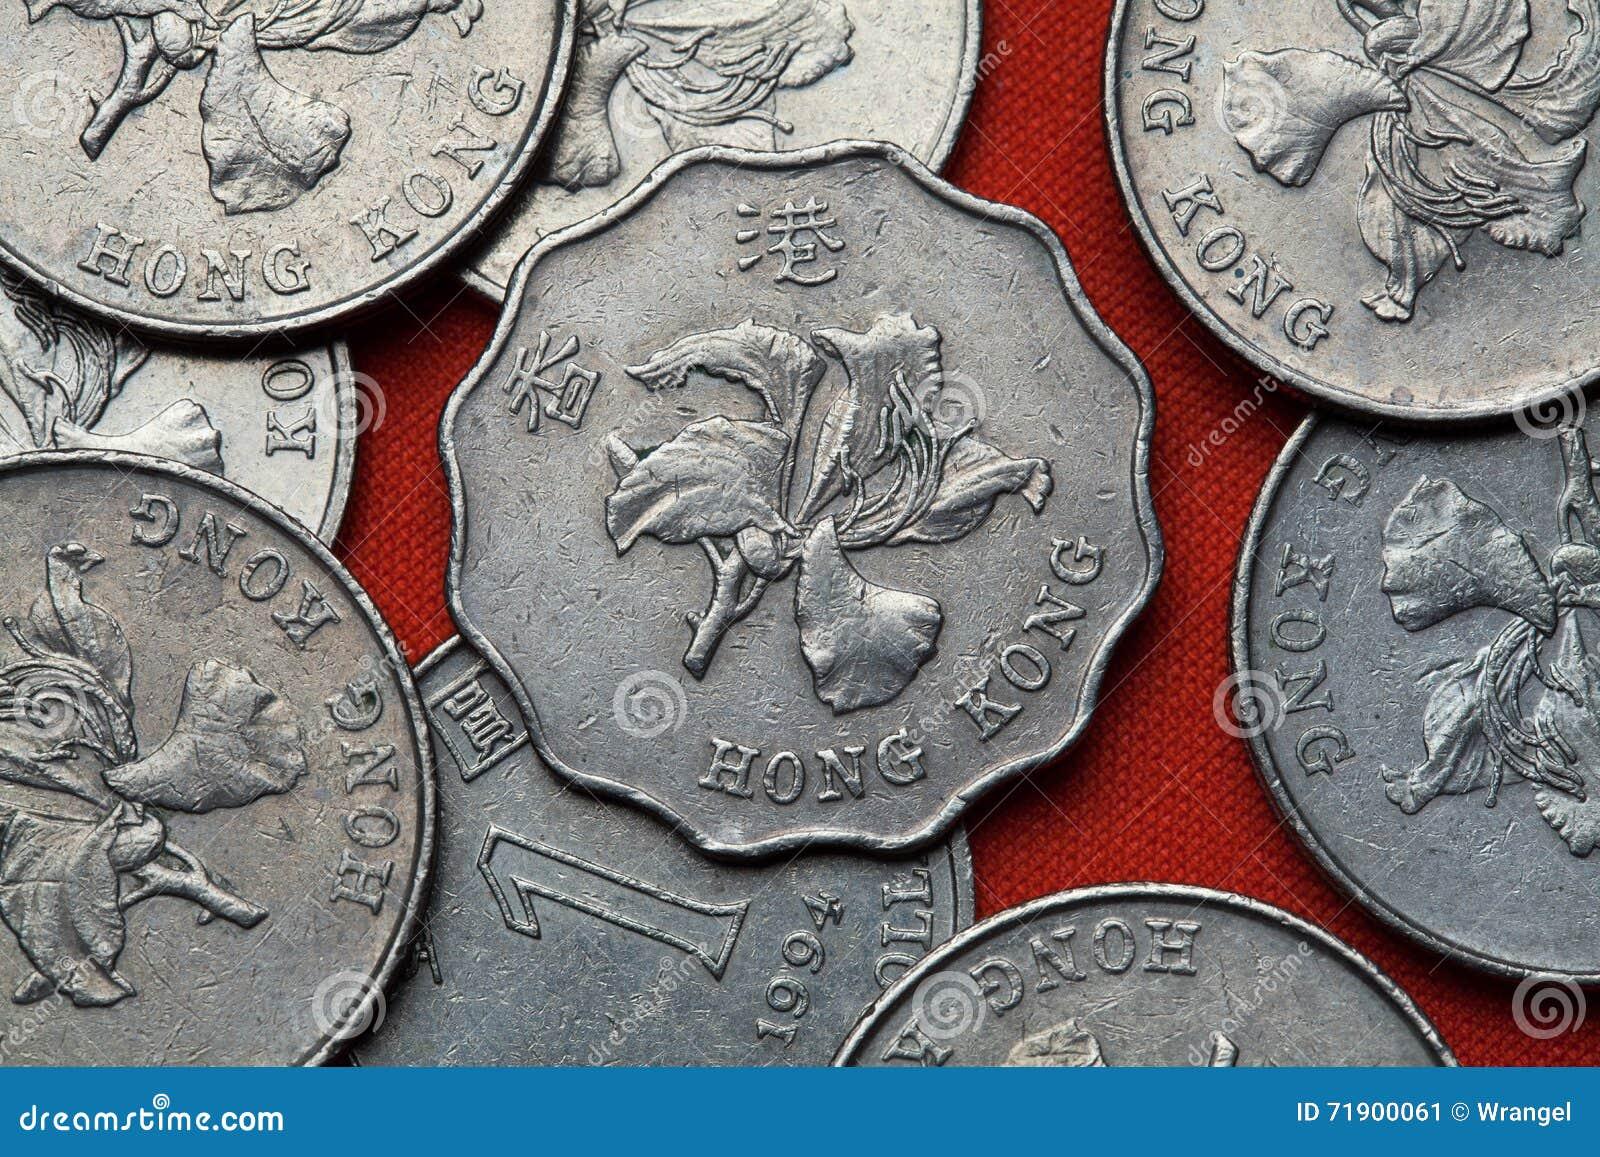 Münzen von Hong Kong